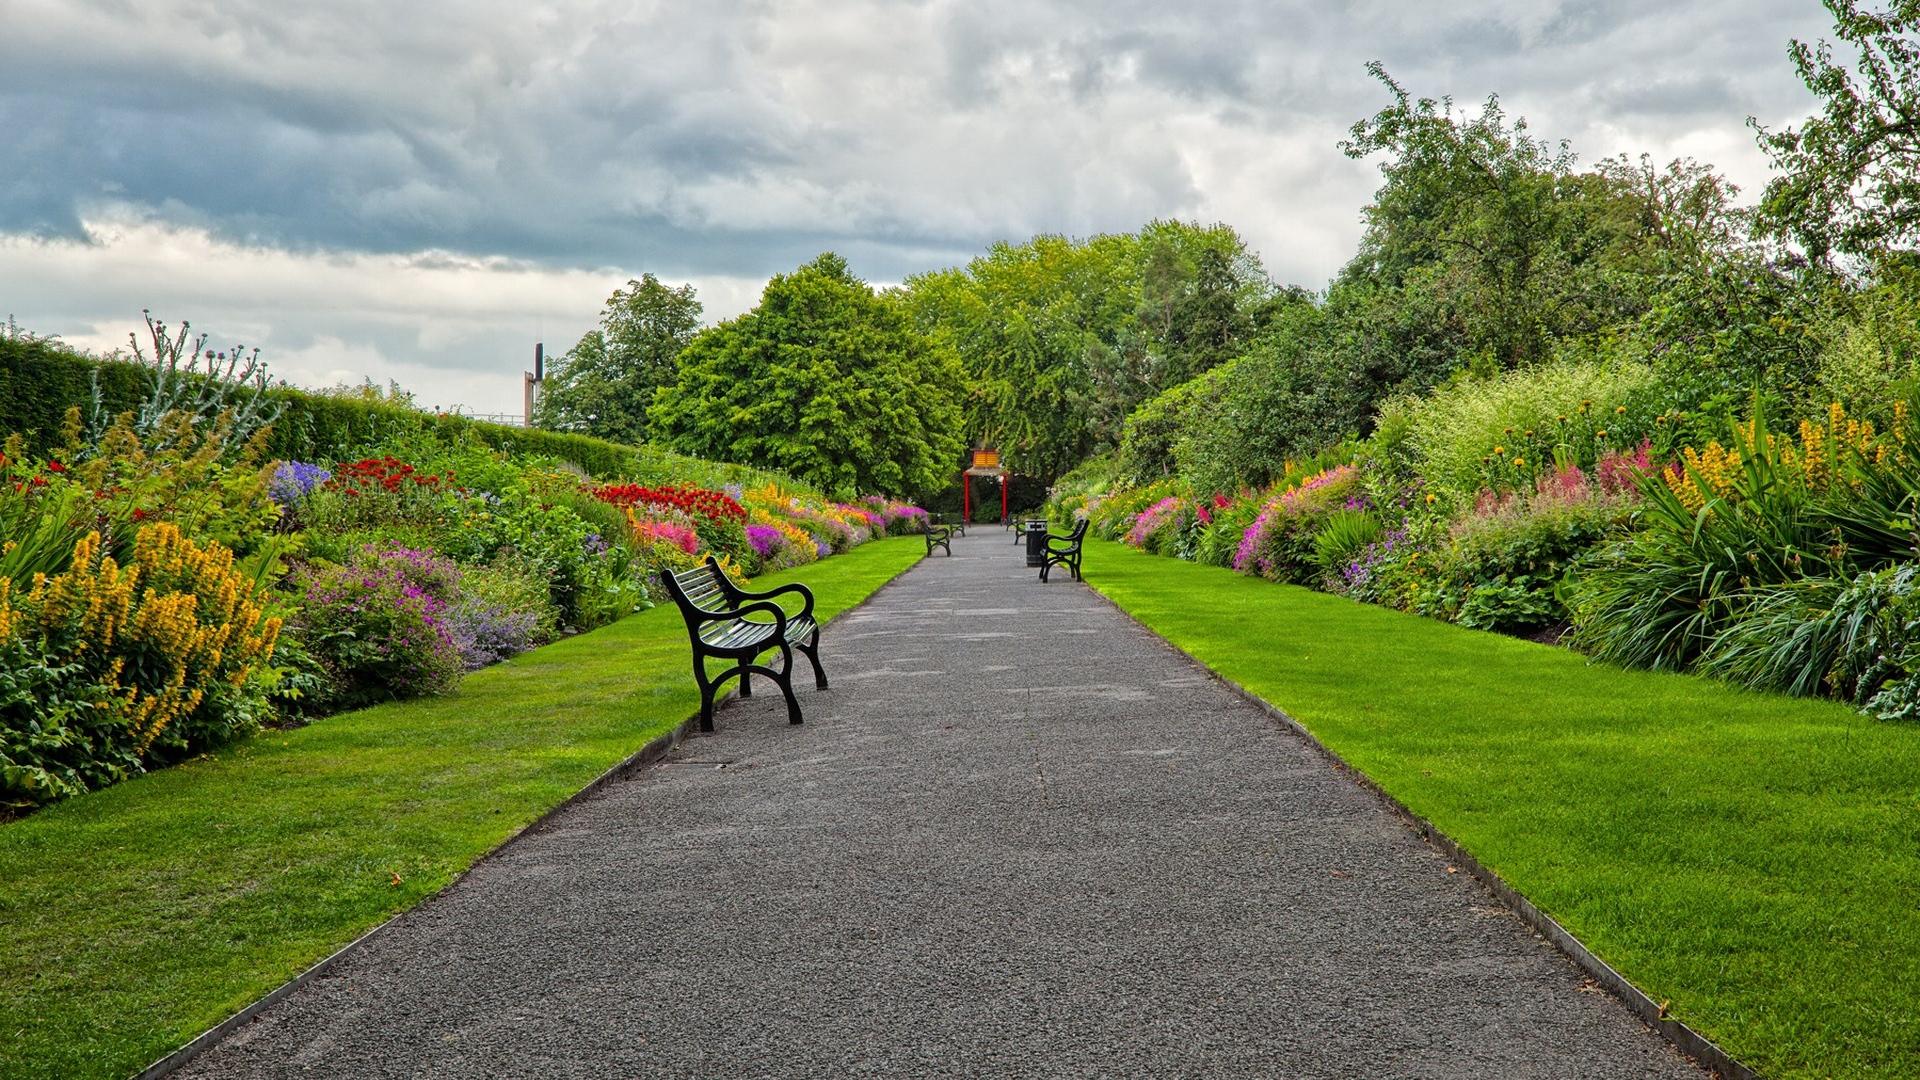 Garden background images